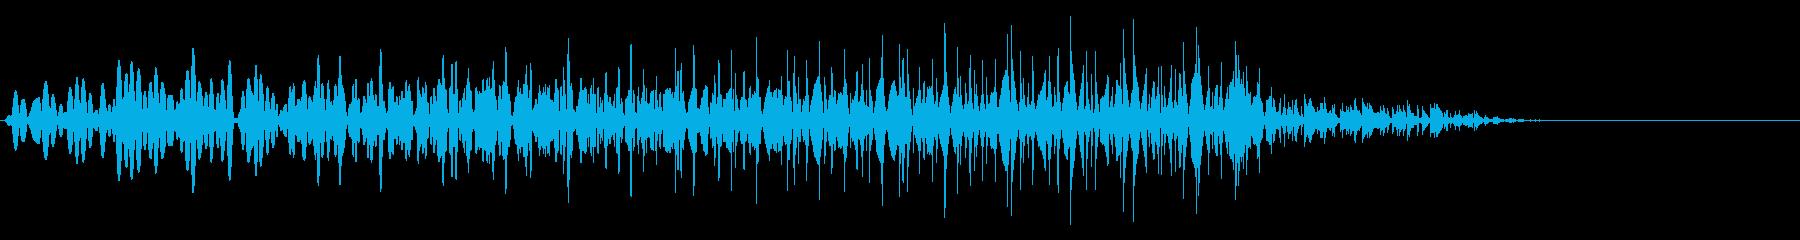 【SE 効果音】SF的な音18の再生済みの波形